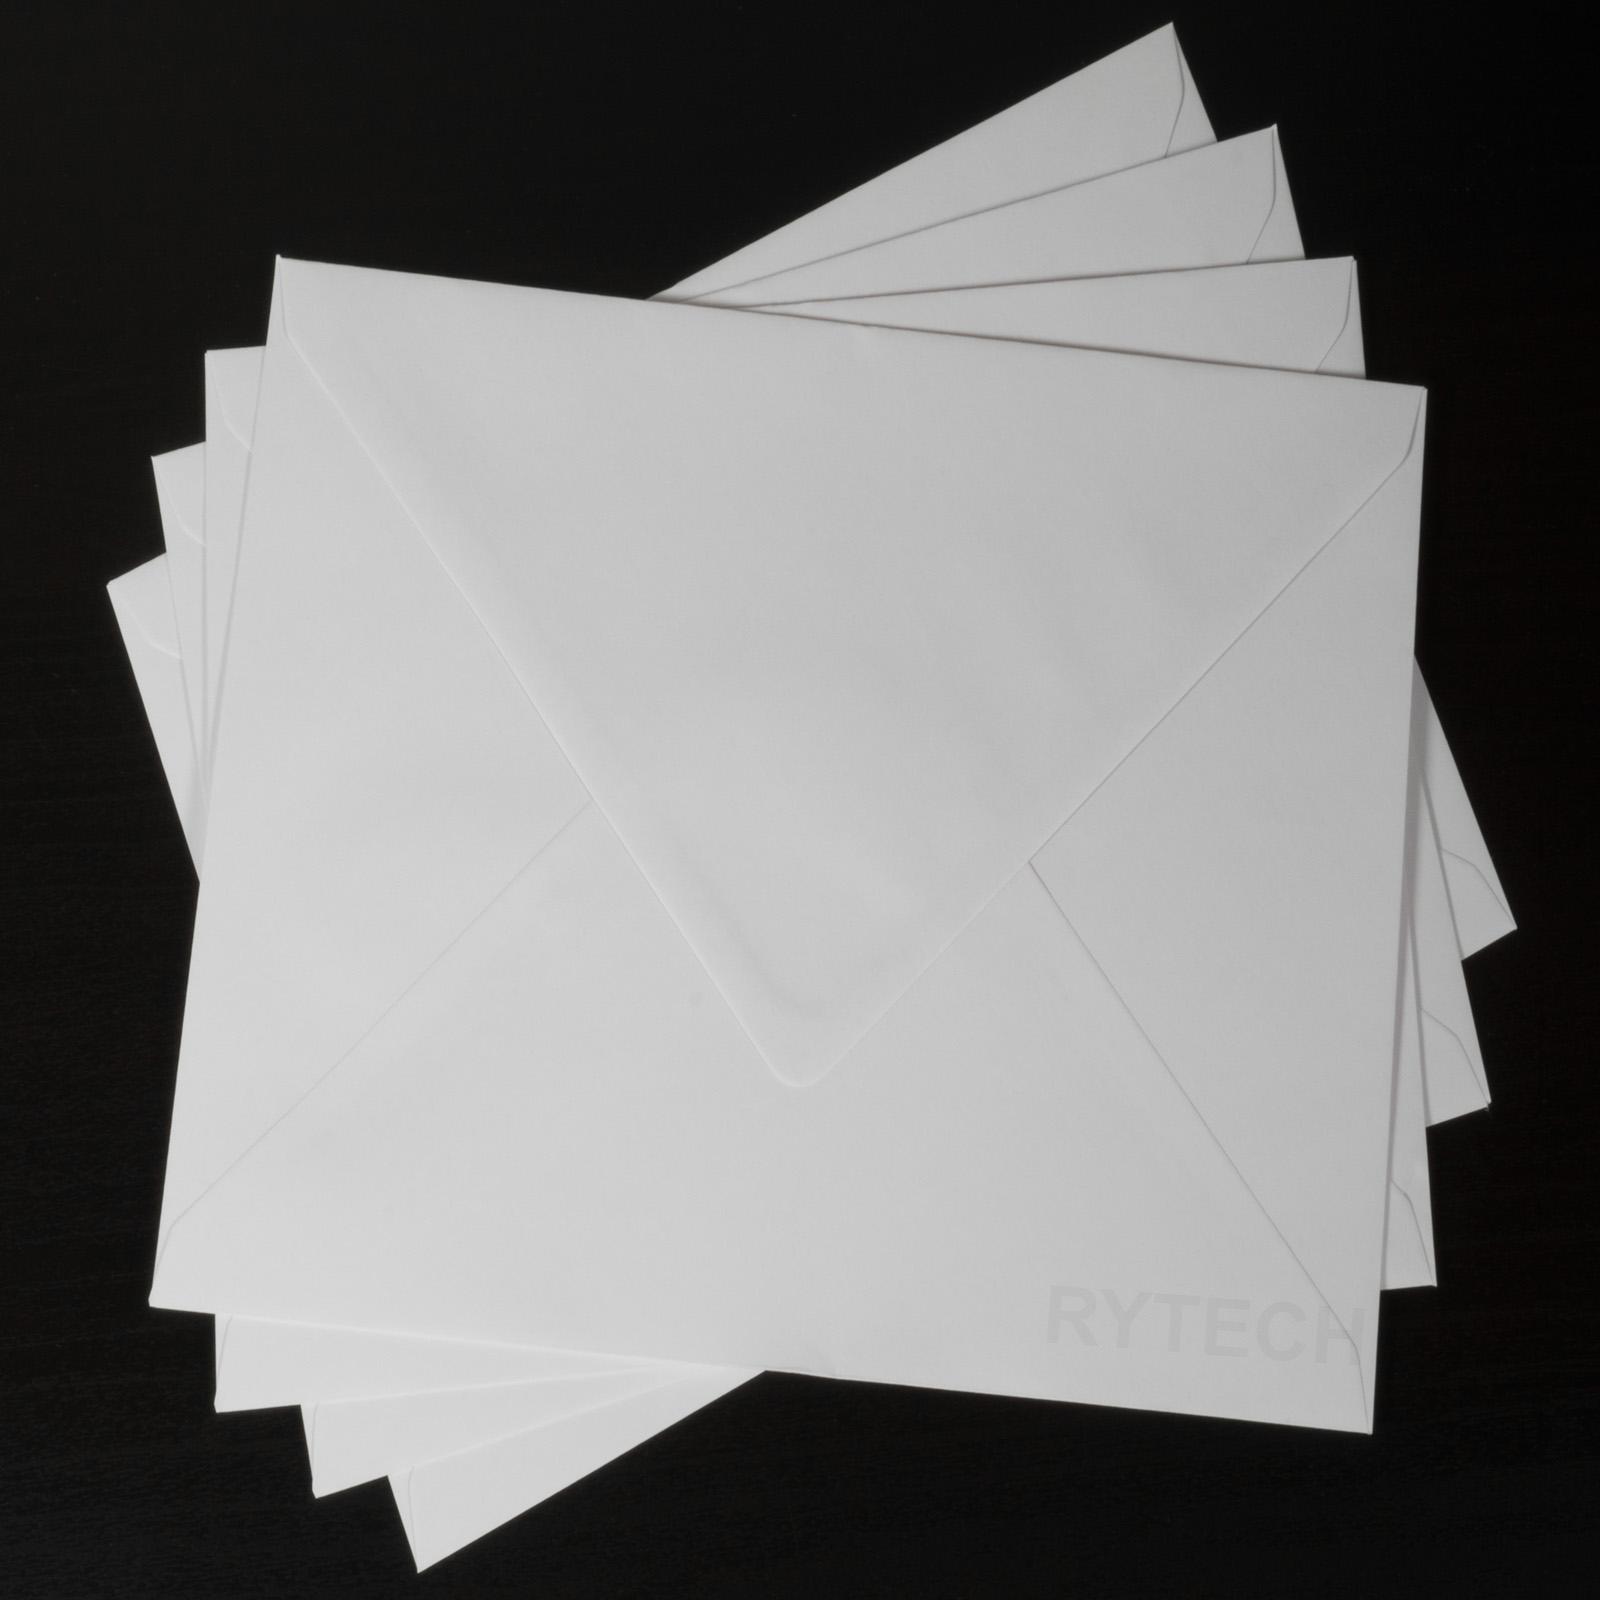 Square 155mm x 155mm Deep Blue Envelopes Greeting Card Invitations Crafts